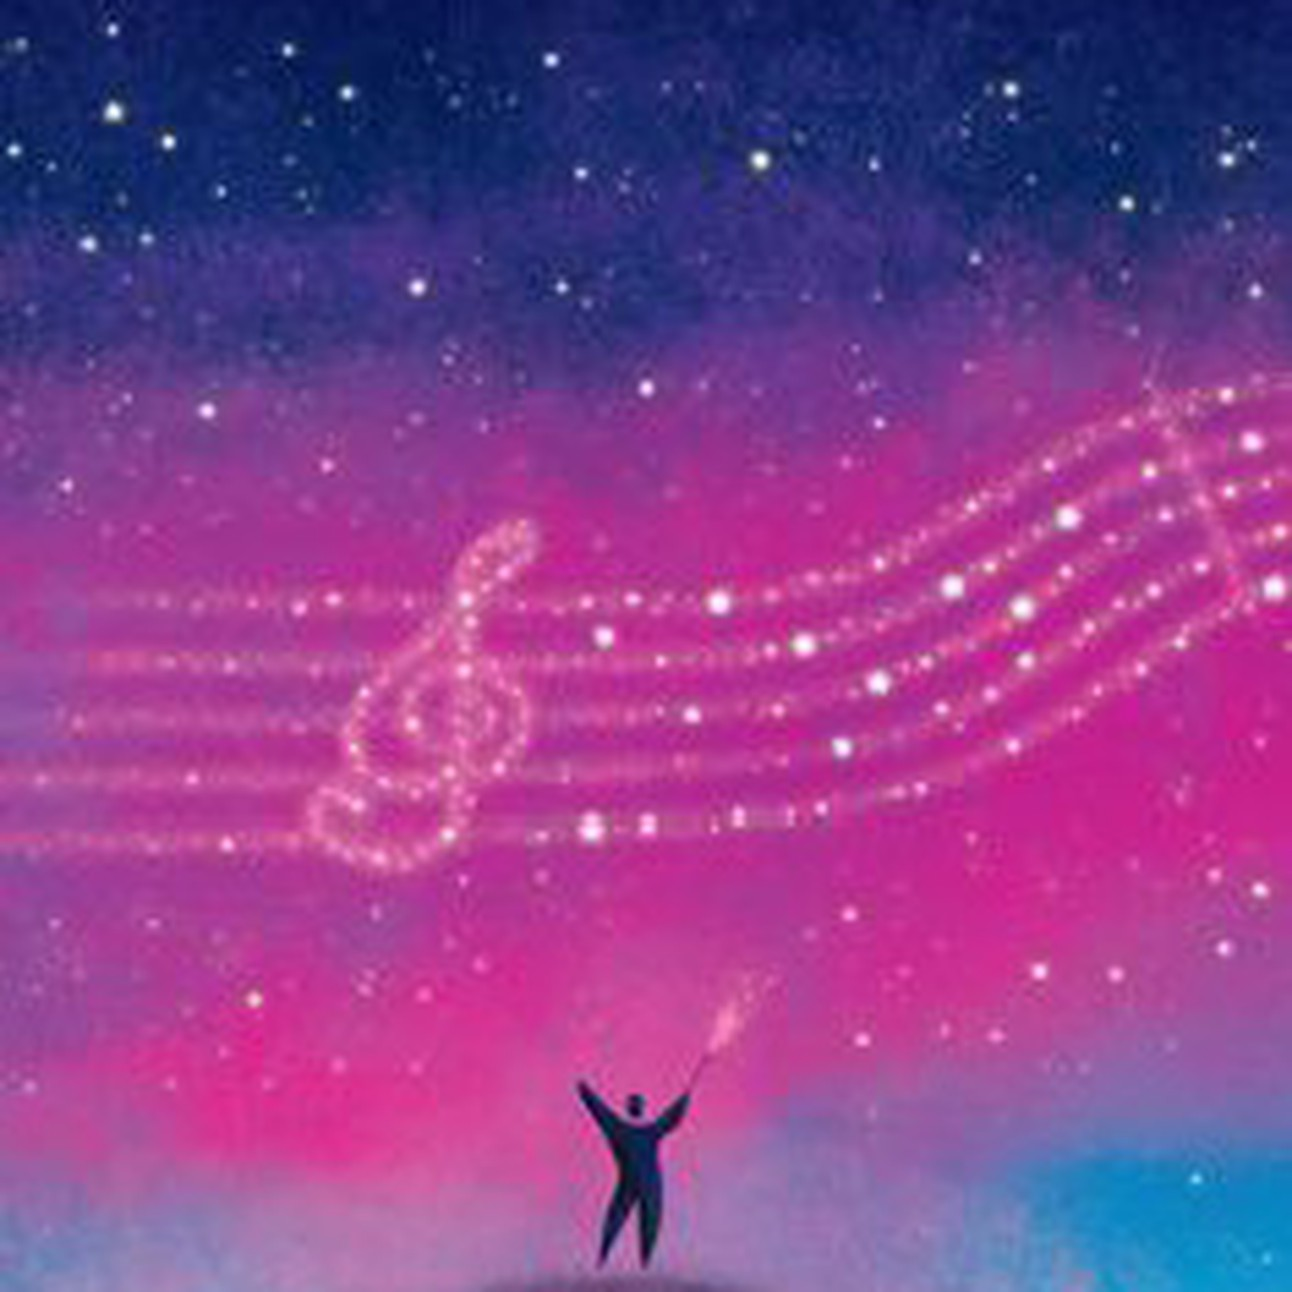 Final Concert Under the Stars 2019